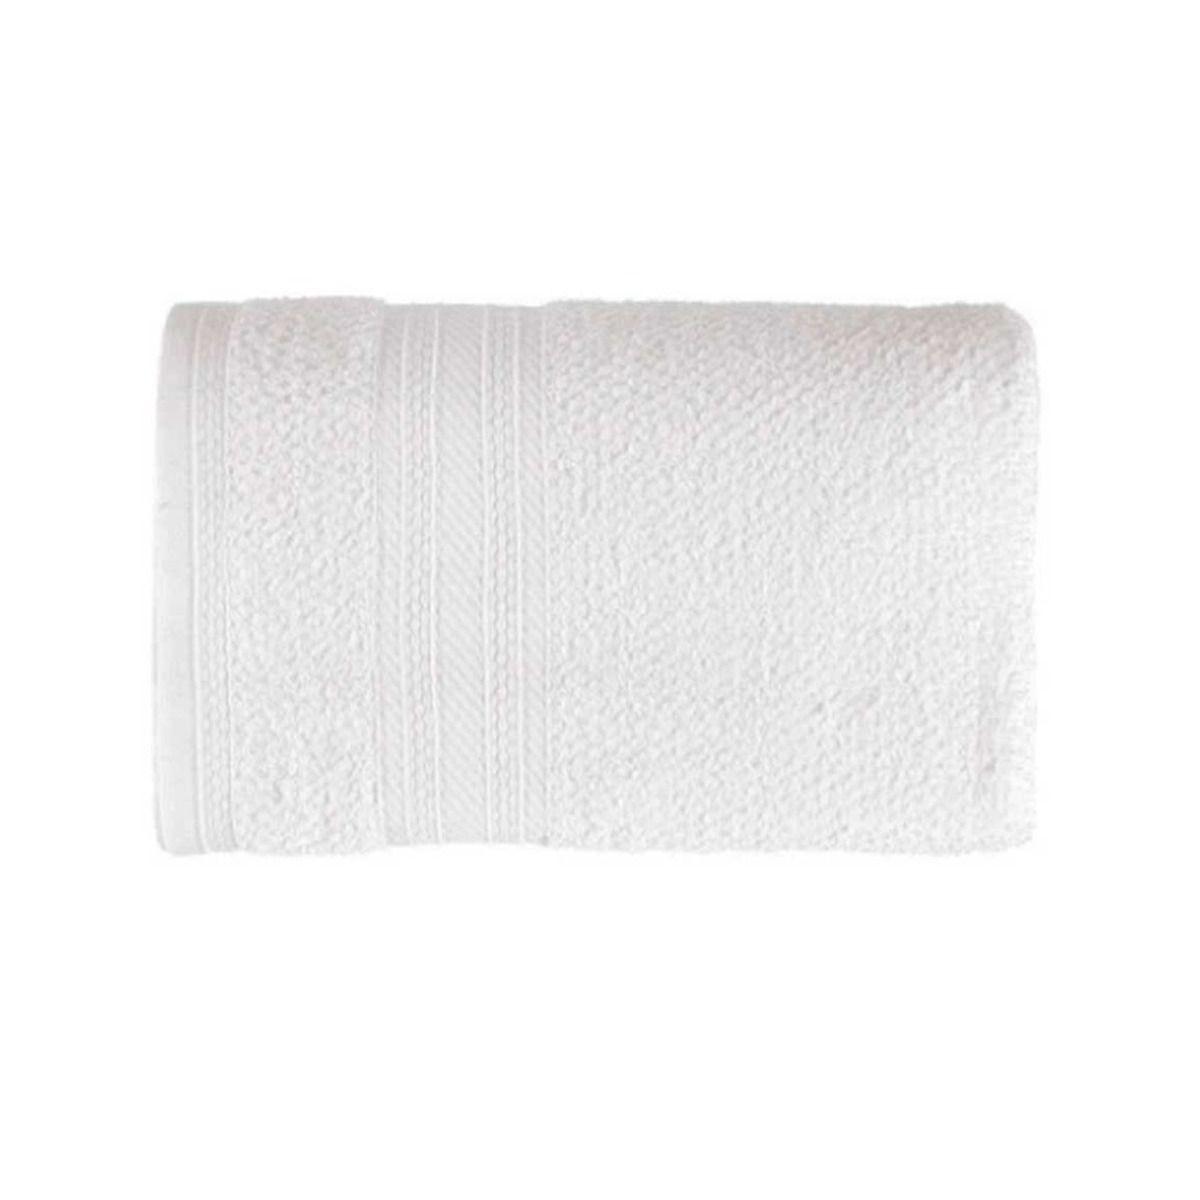 Toalha banho empire 70x135 Branco